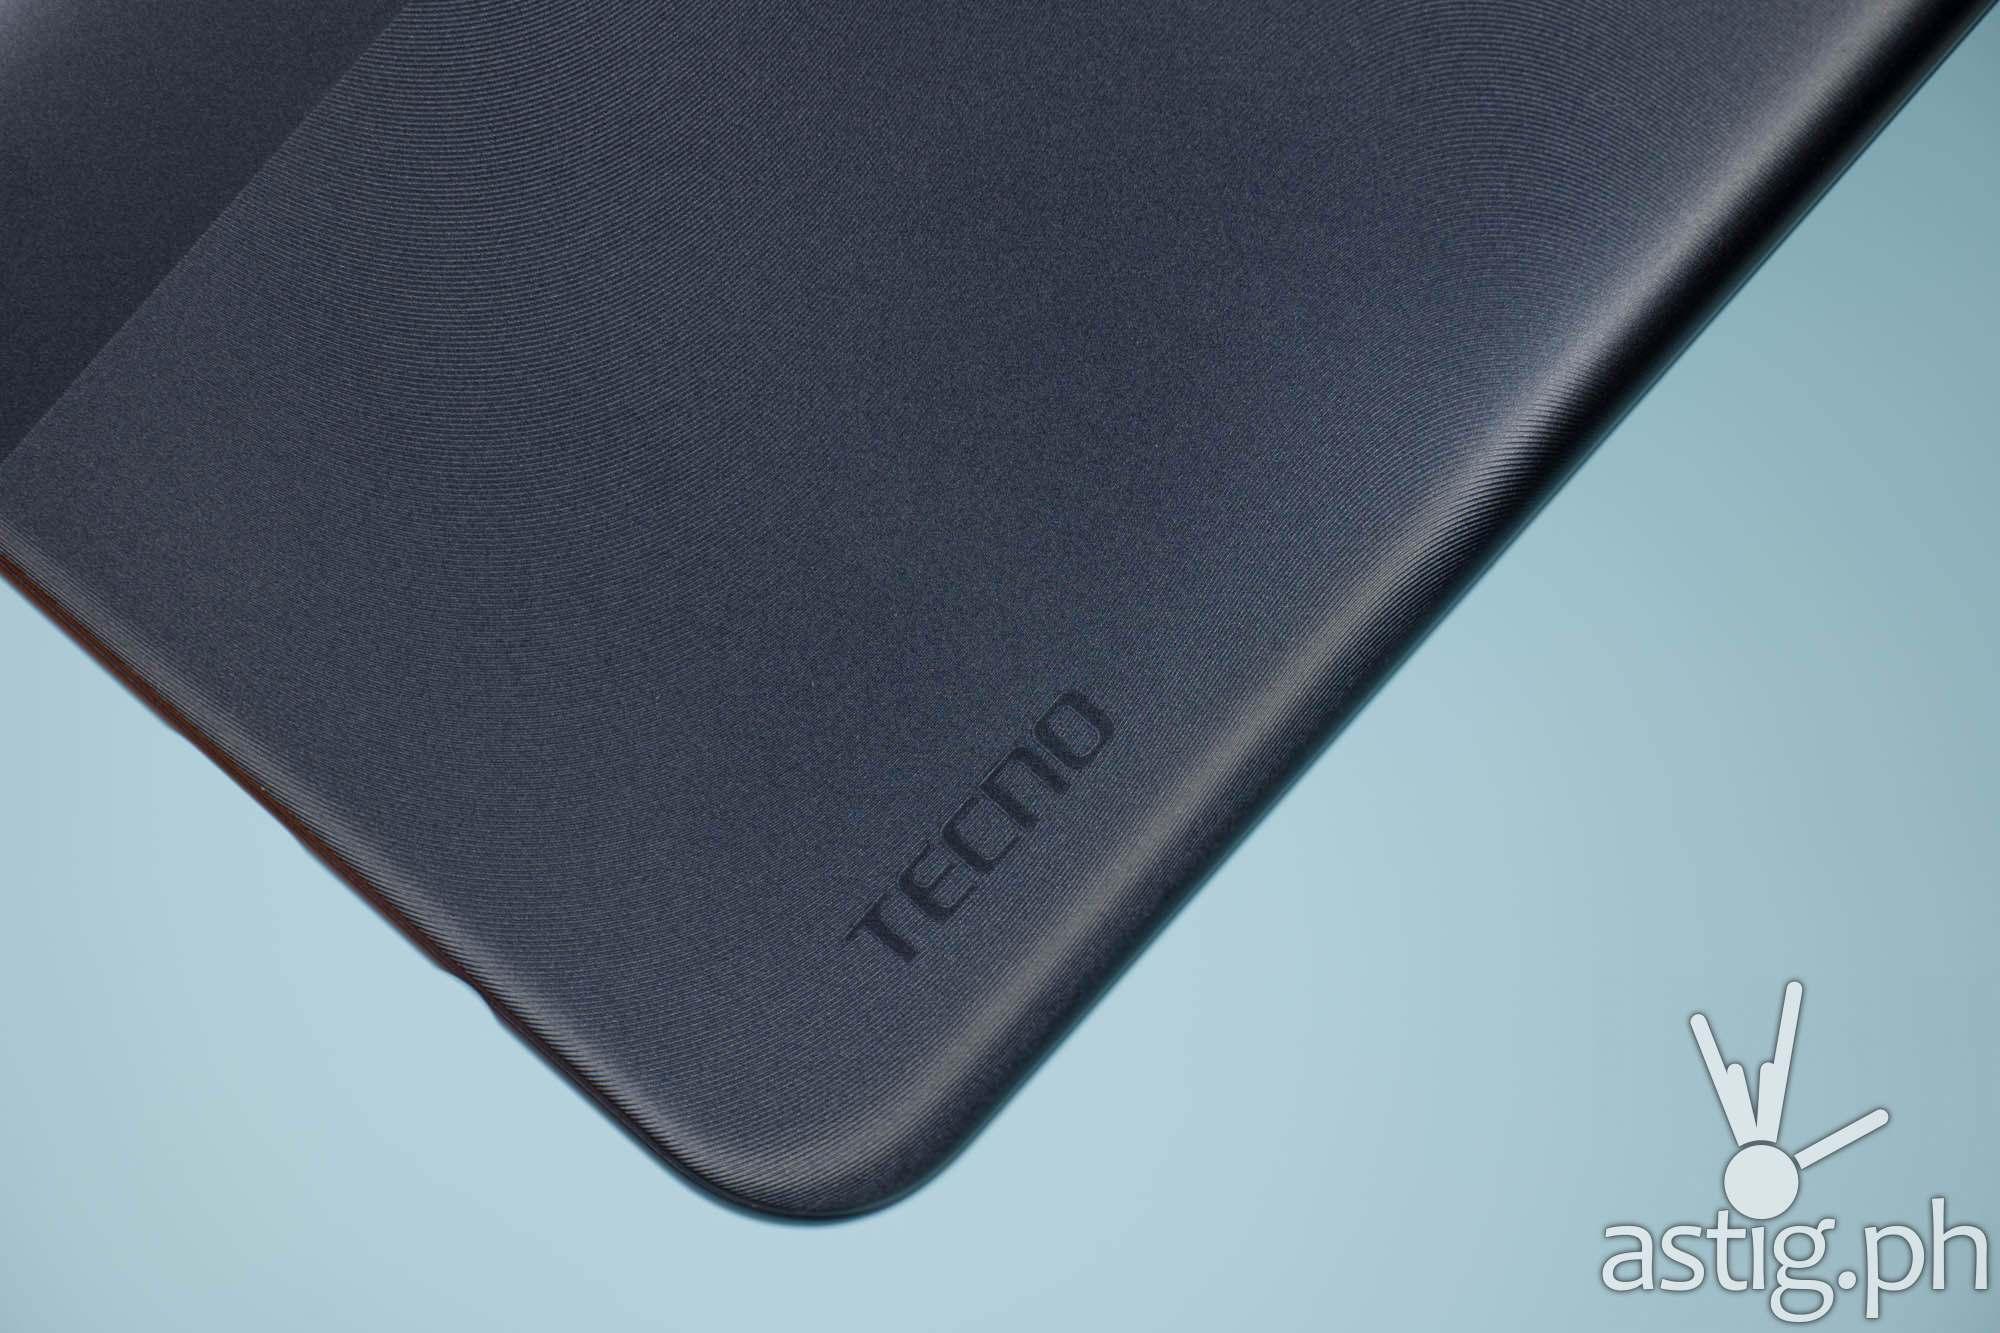 Back panel - TECNO Spark 7 Pro